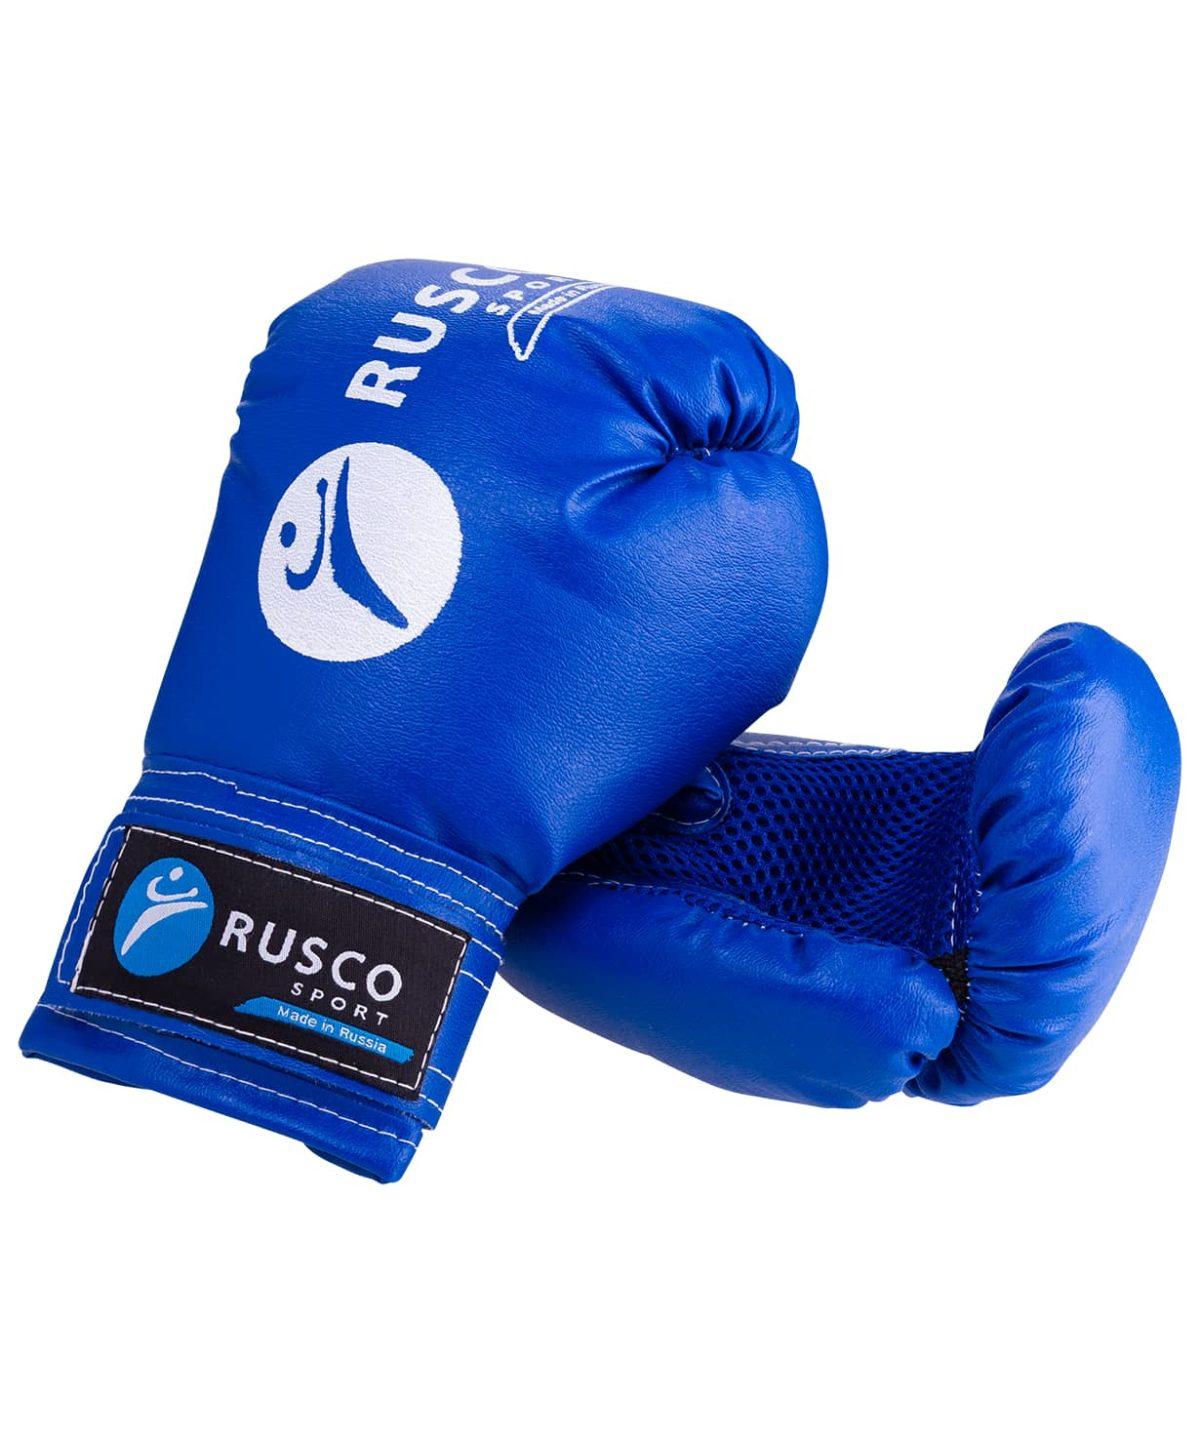 RUSCO Набор для бокса 6oz, к/з  13972 - 5